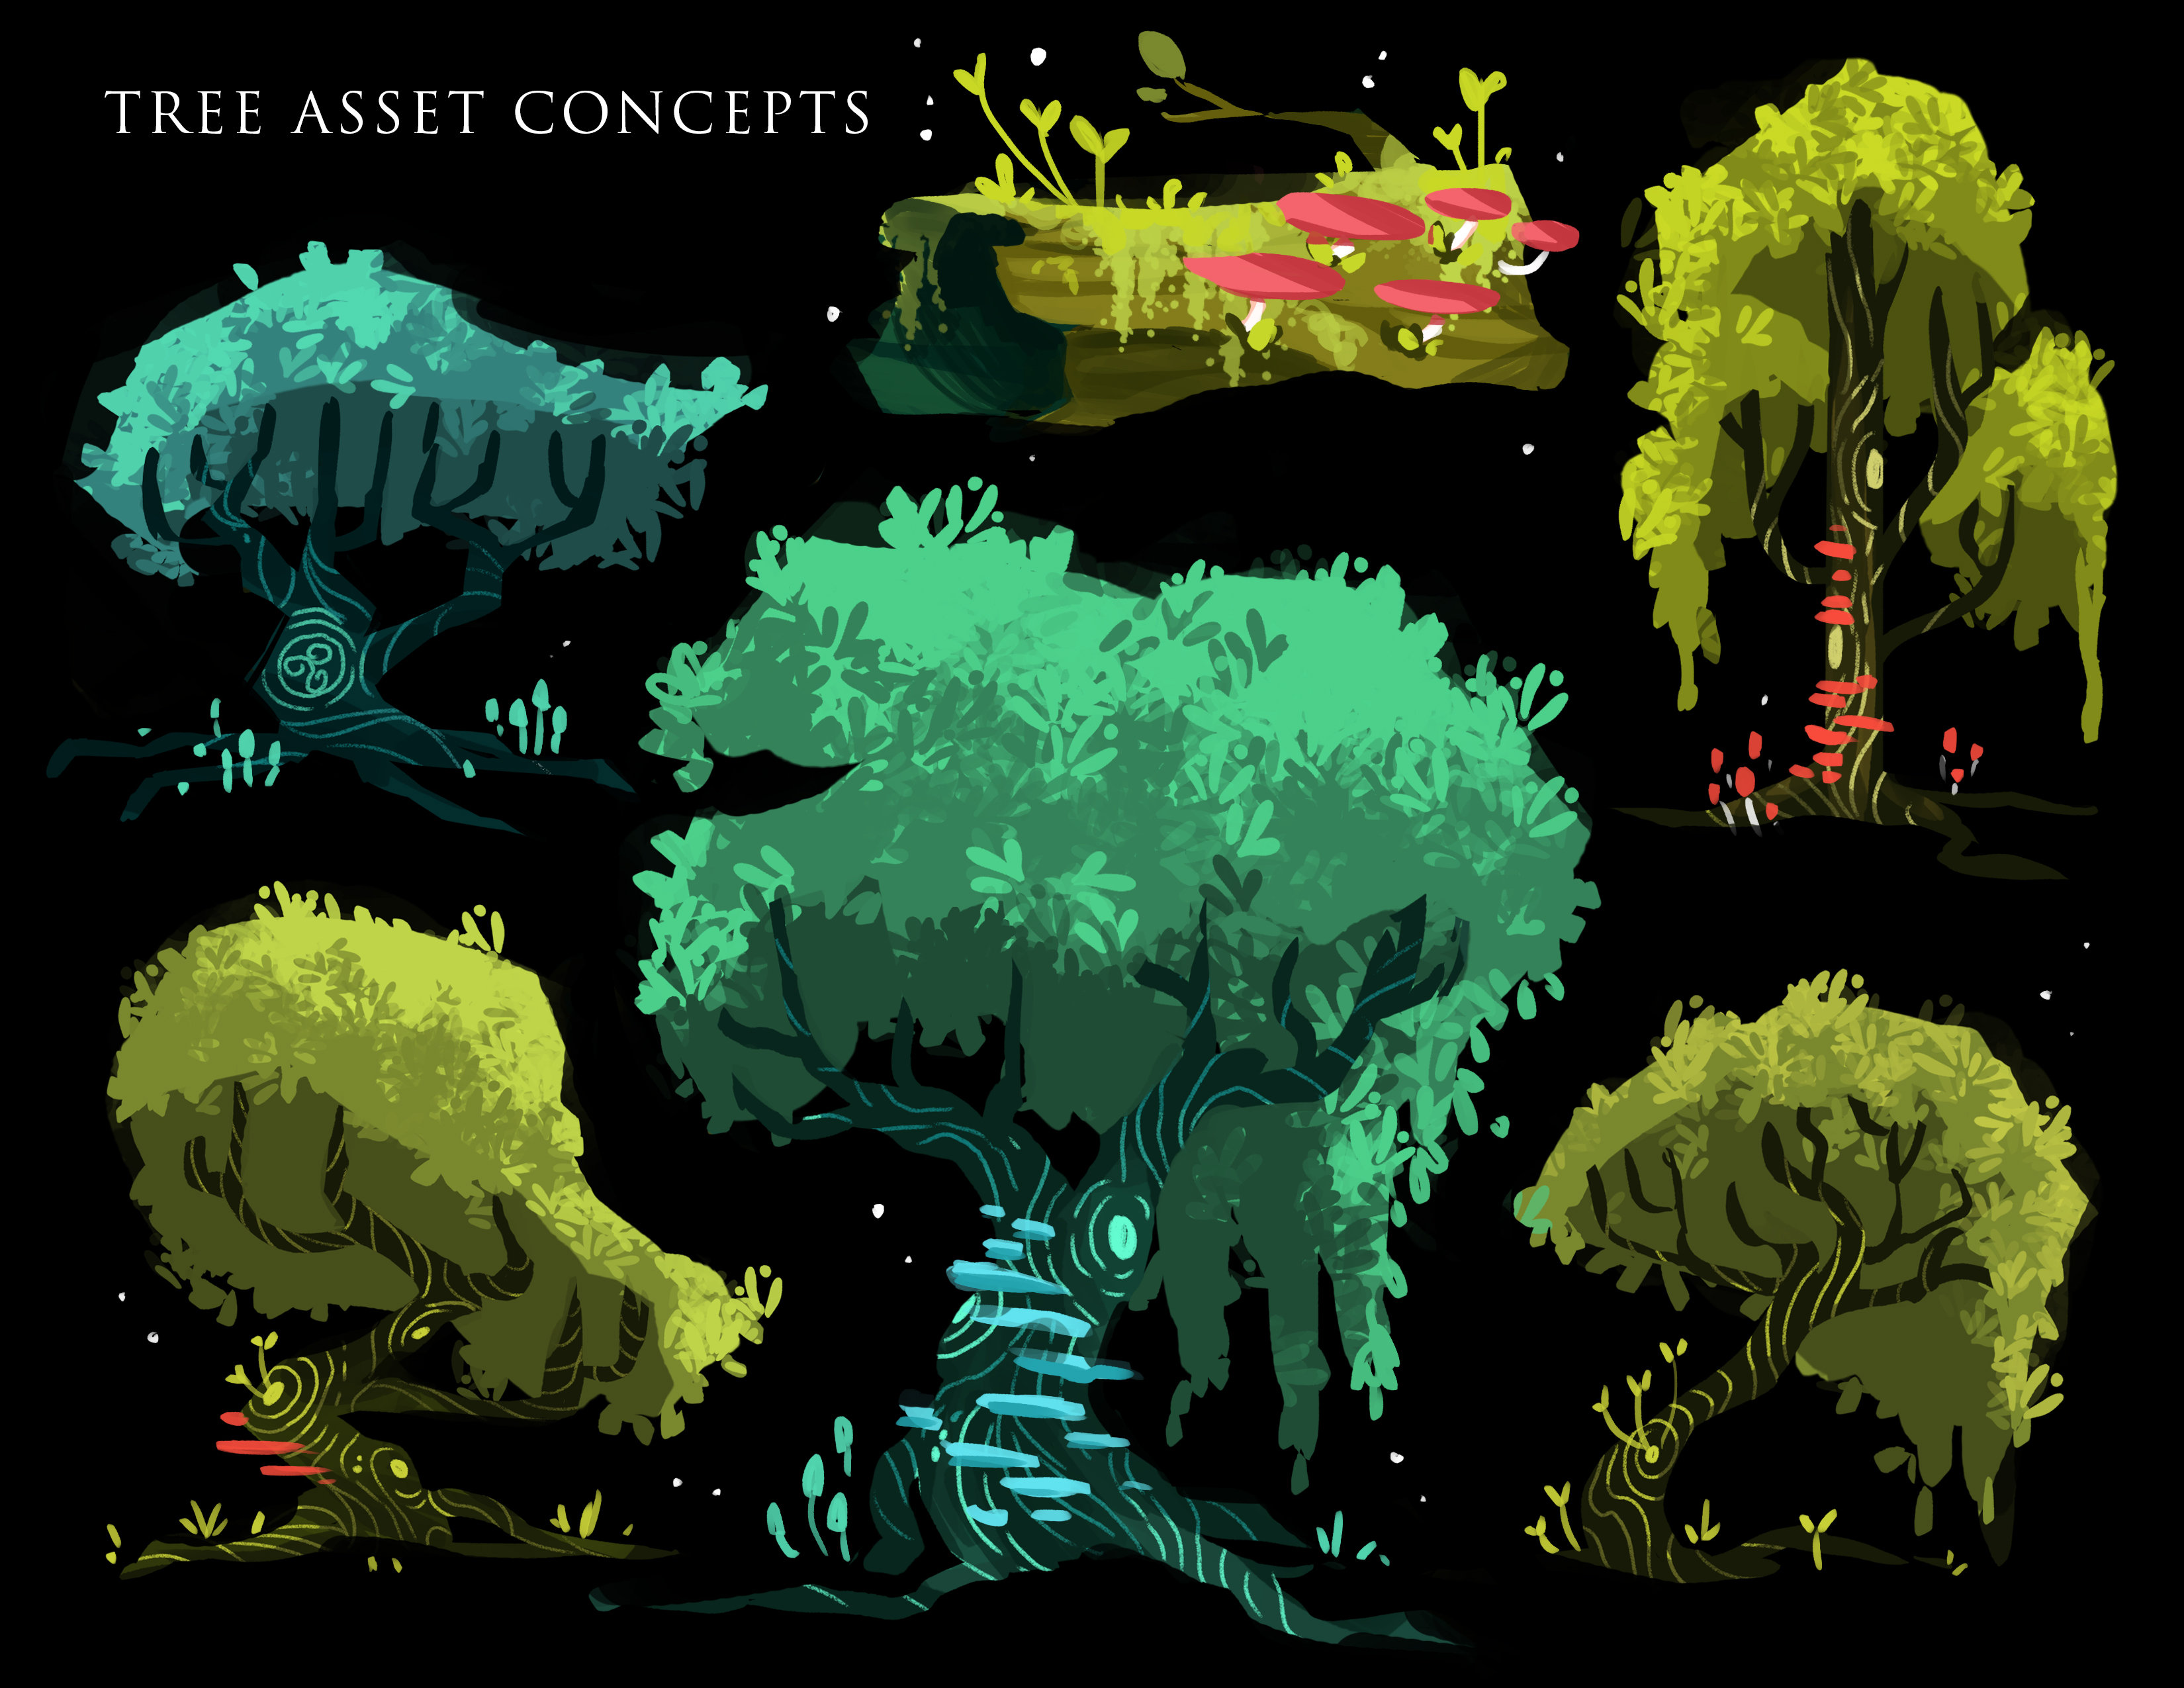 tree asset concepts